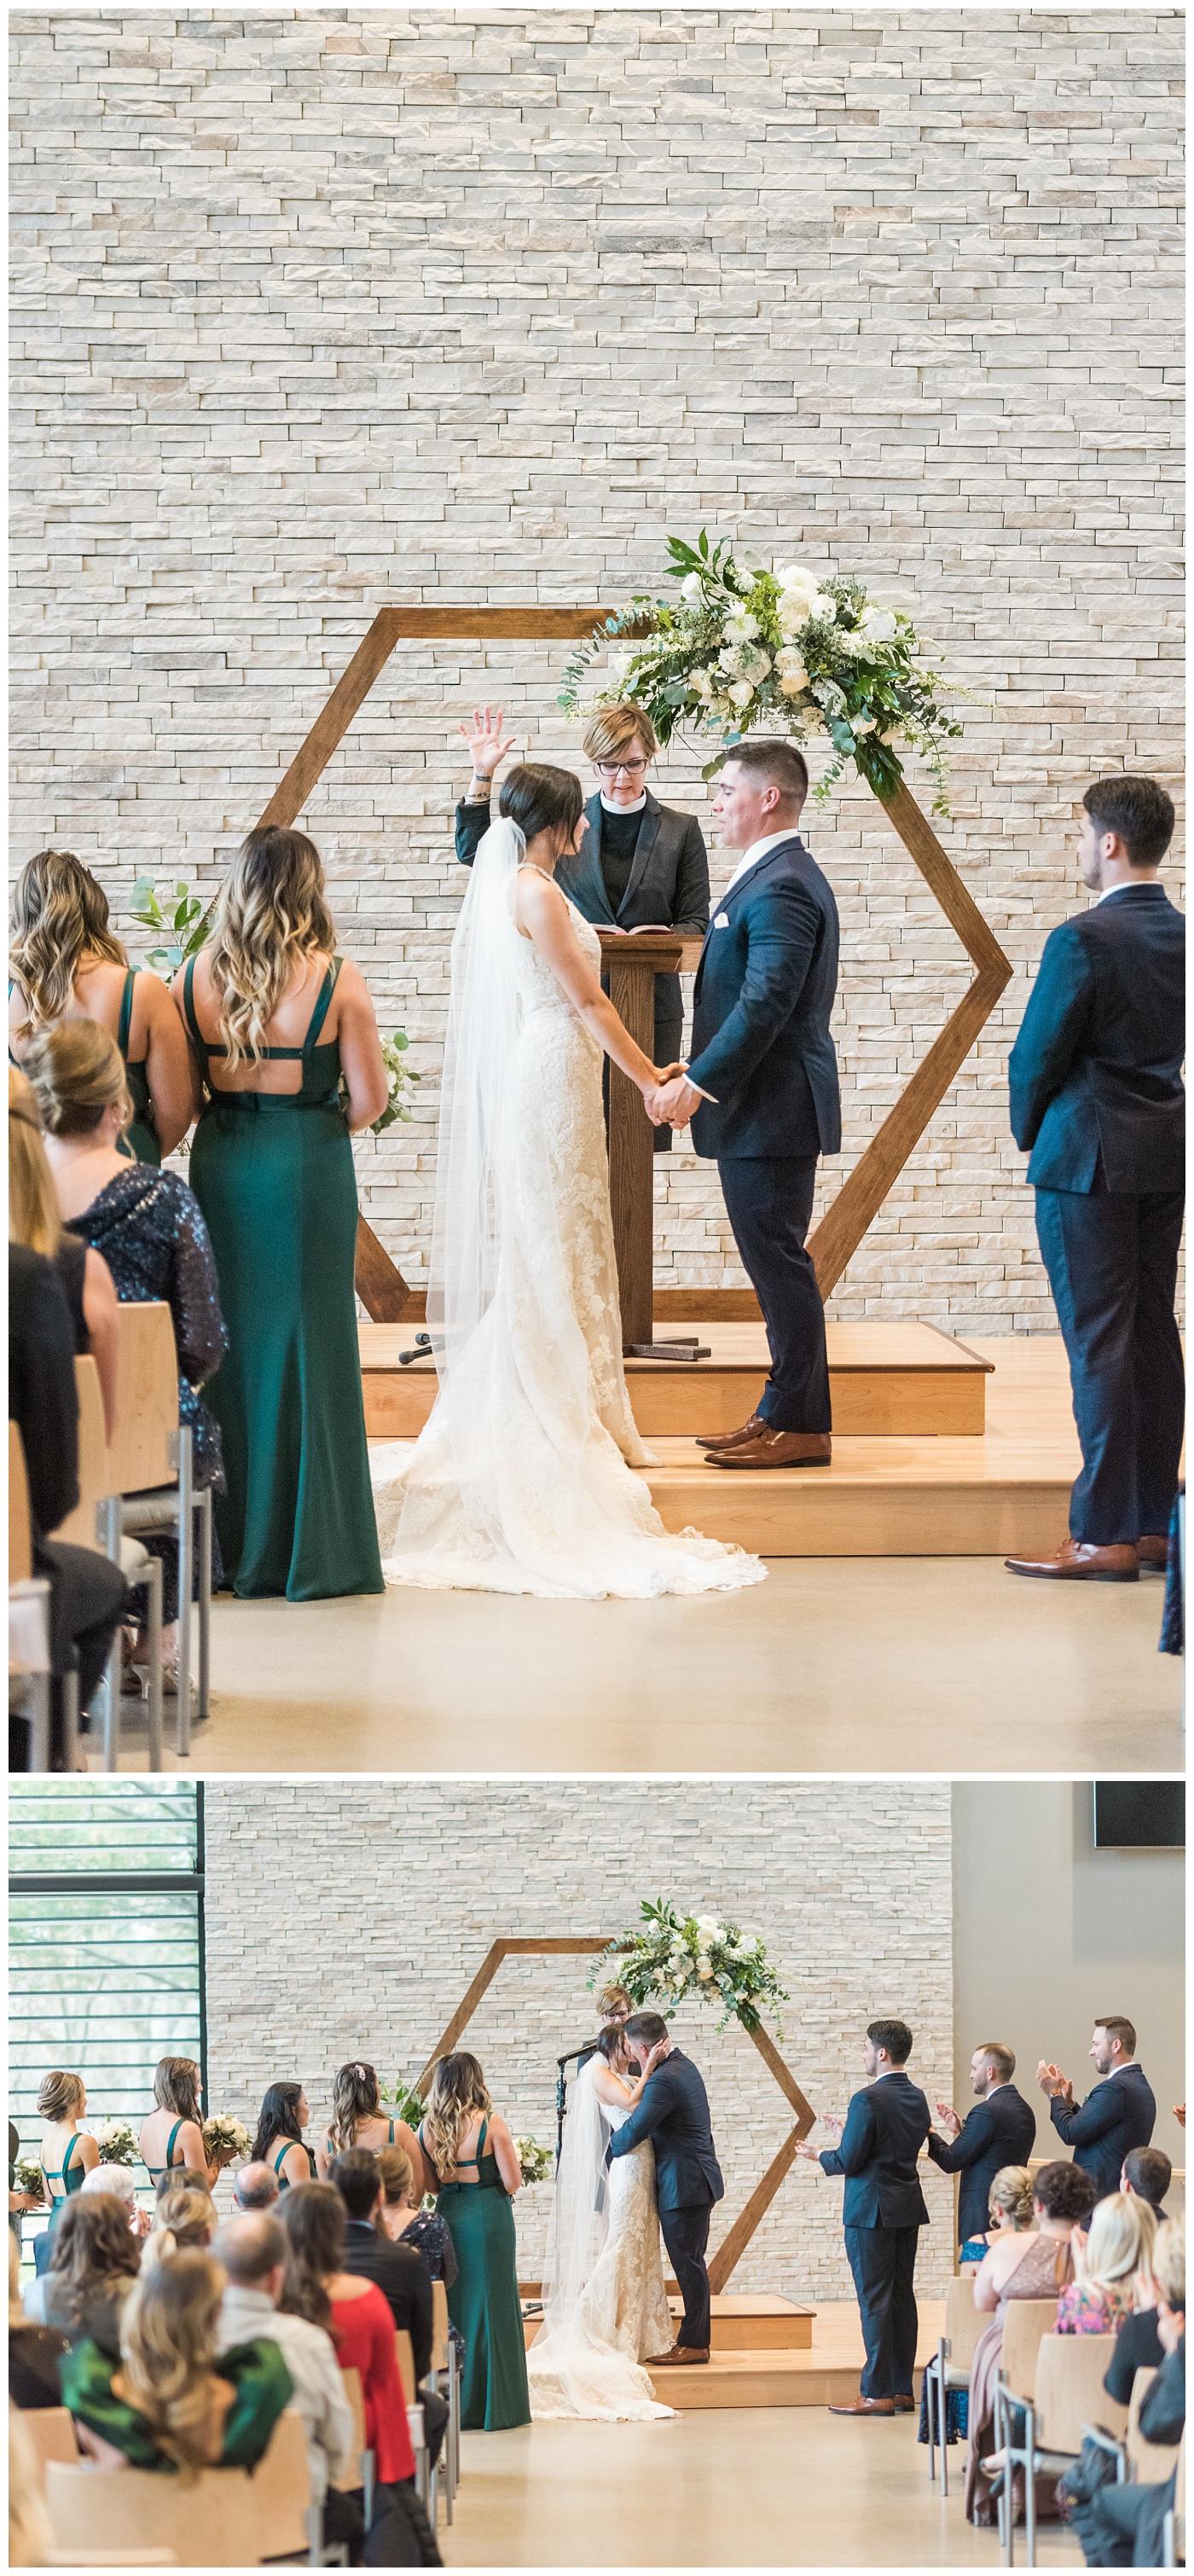 Stephanie Marie Photography Unitarian Universalist Society Church Ceremony Hotel Kirkwood Reception Cedar Rapids Iowa City Wedding Photographer Sean Madison Moore_0041.jpg